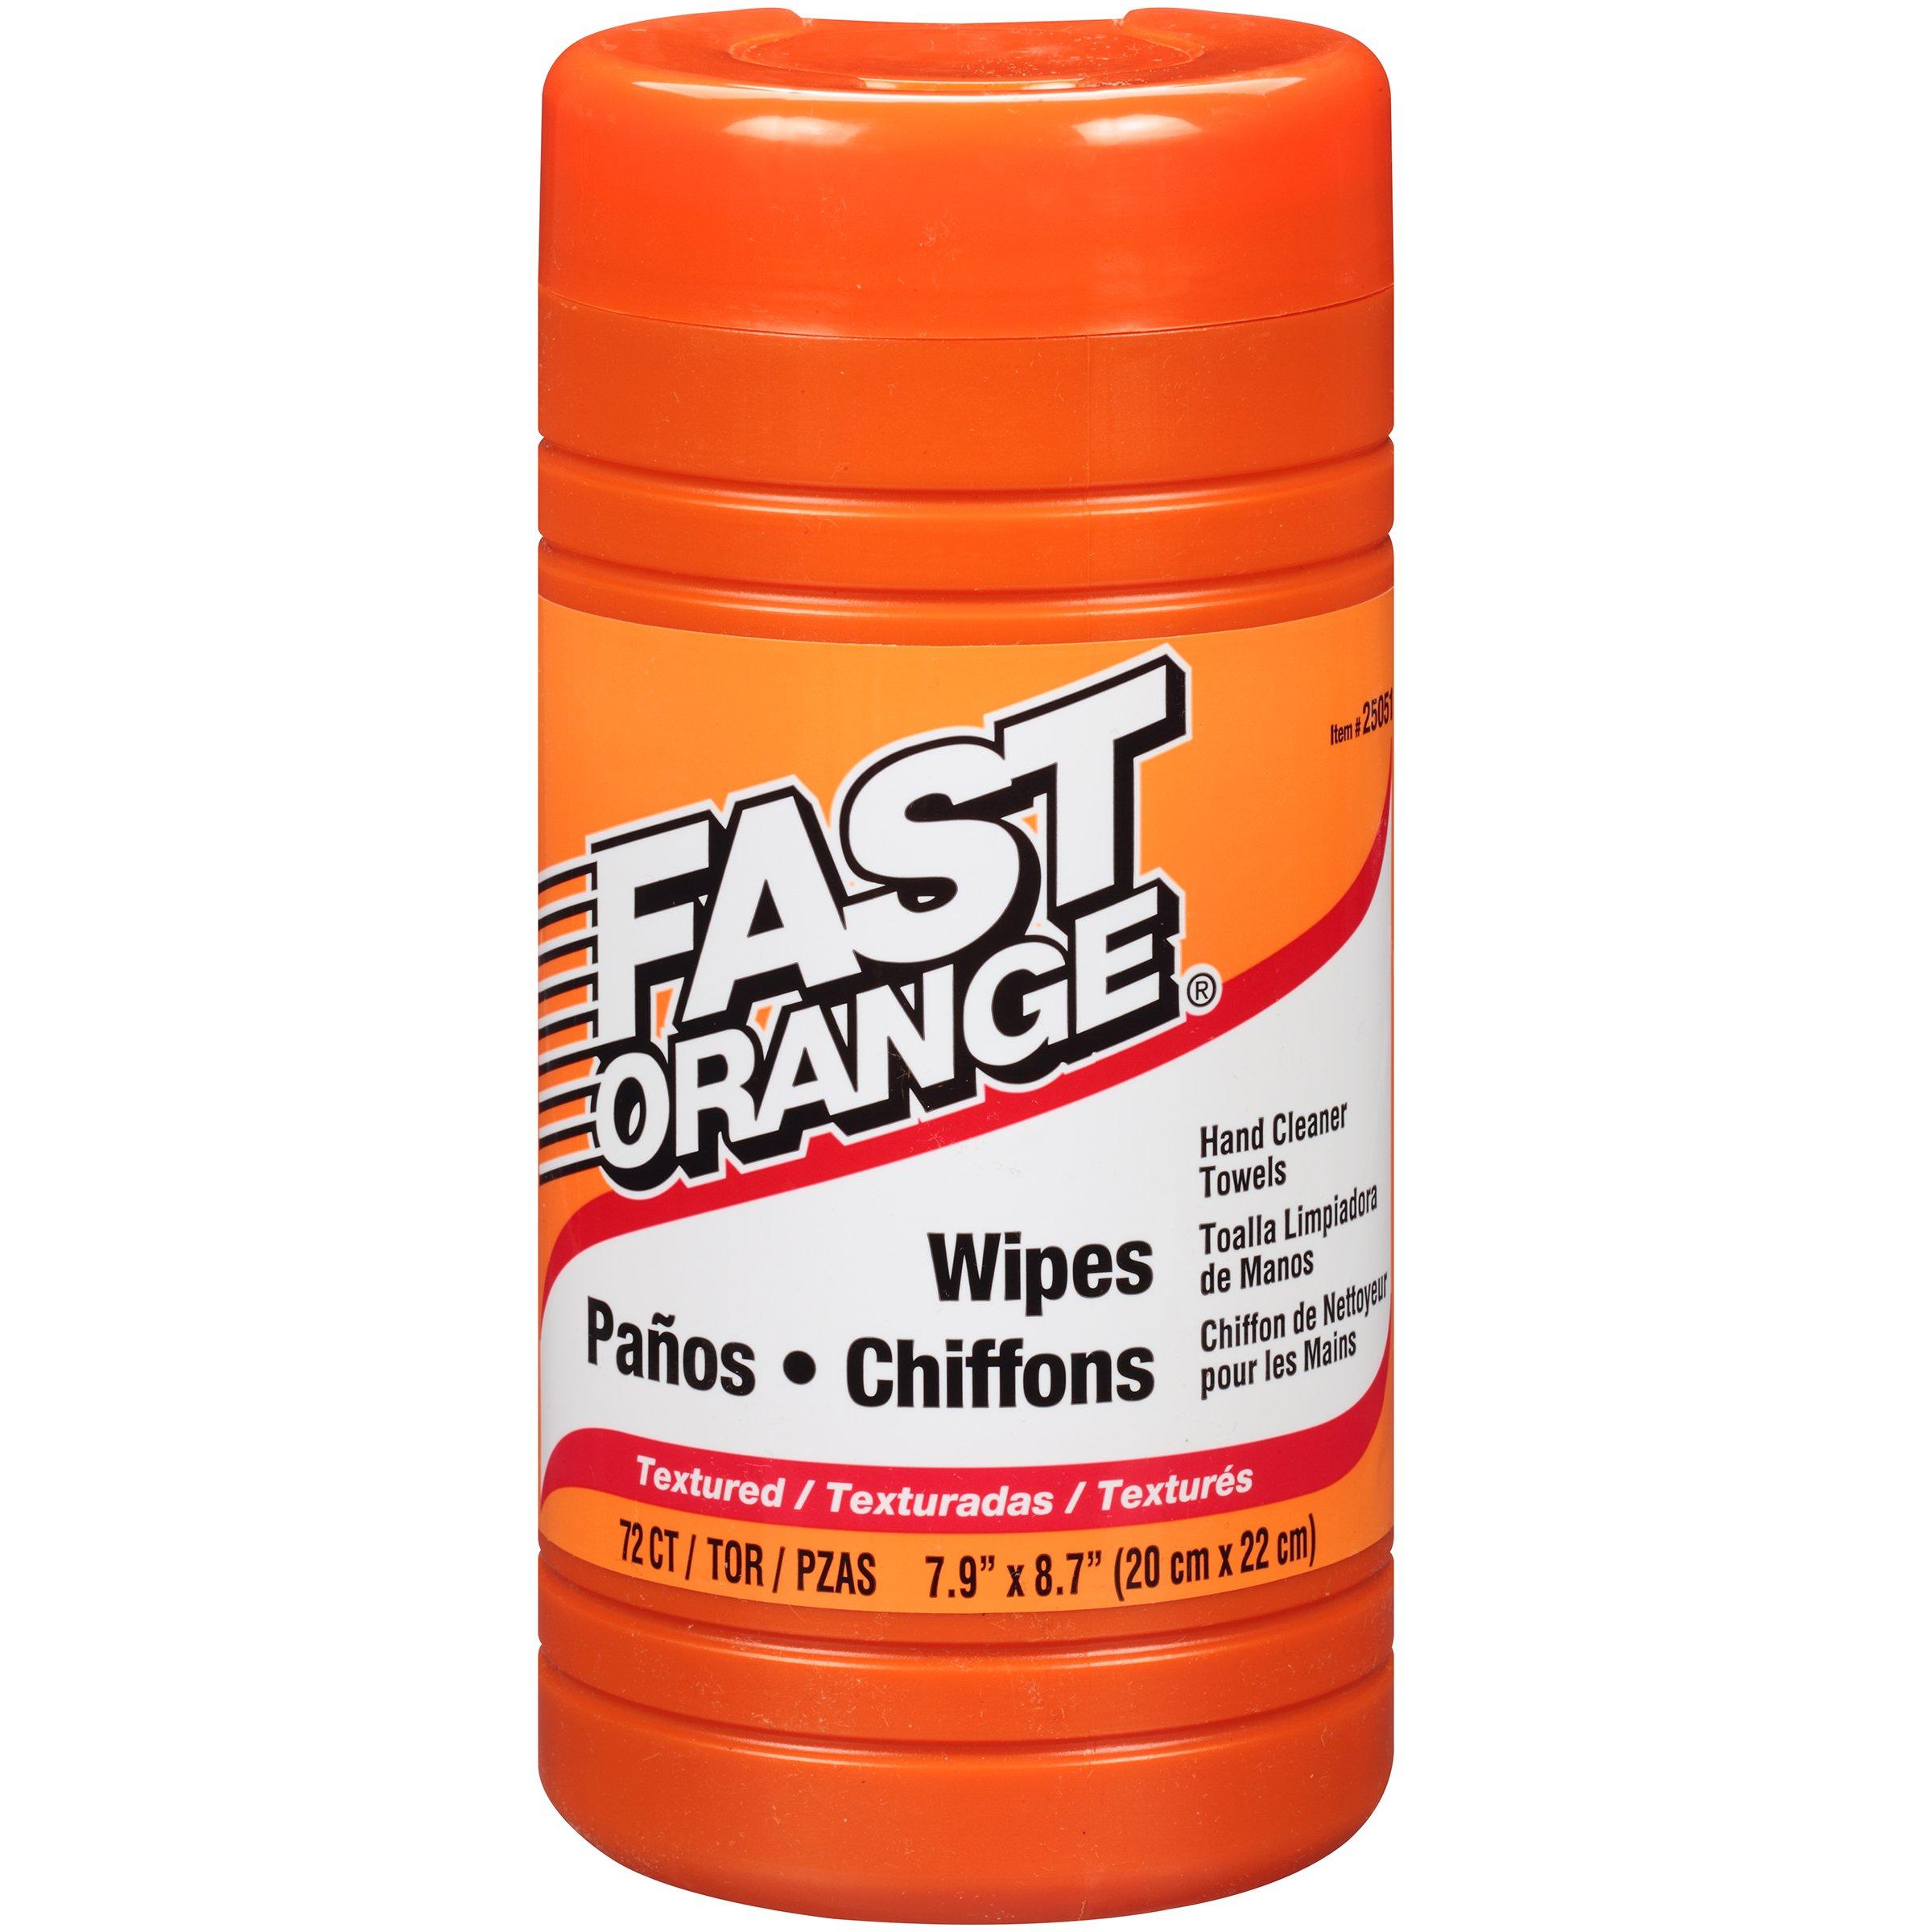 Permatex 25051-6PK Fast Orange Wipe - 72 Count, (Pack of 6) by Permatex (Image #1)